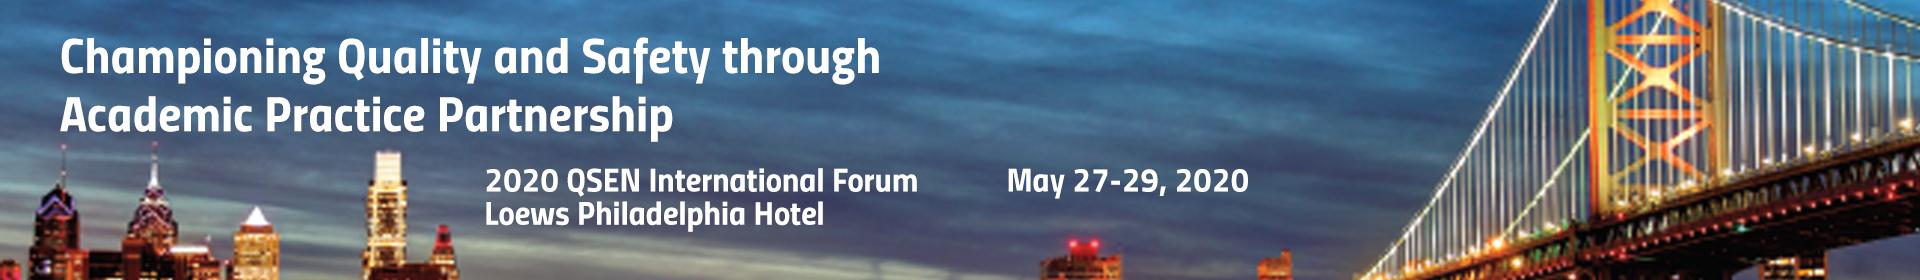 QSEN International Forum 2020 Event Banner